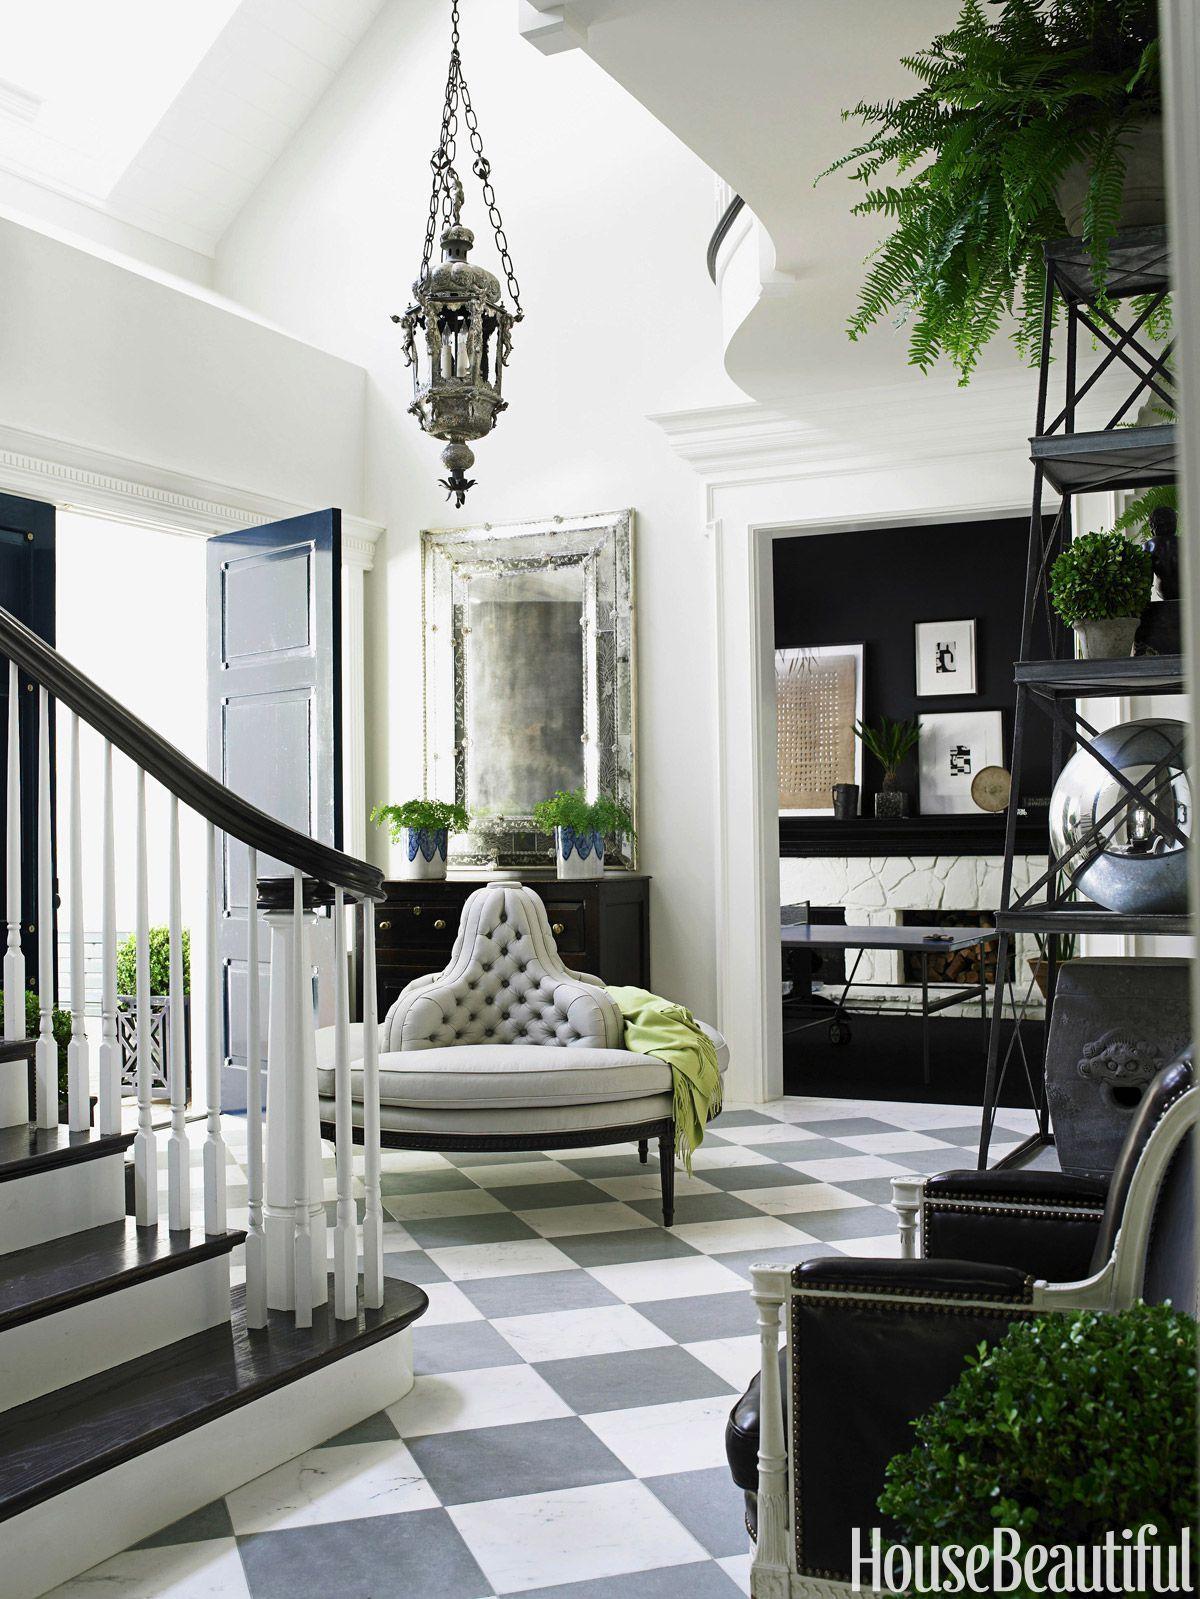 How to decorate foyer also ask  designer do  my interior design tips rh pinterest